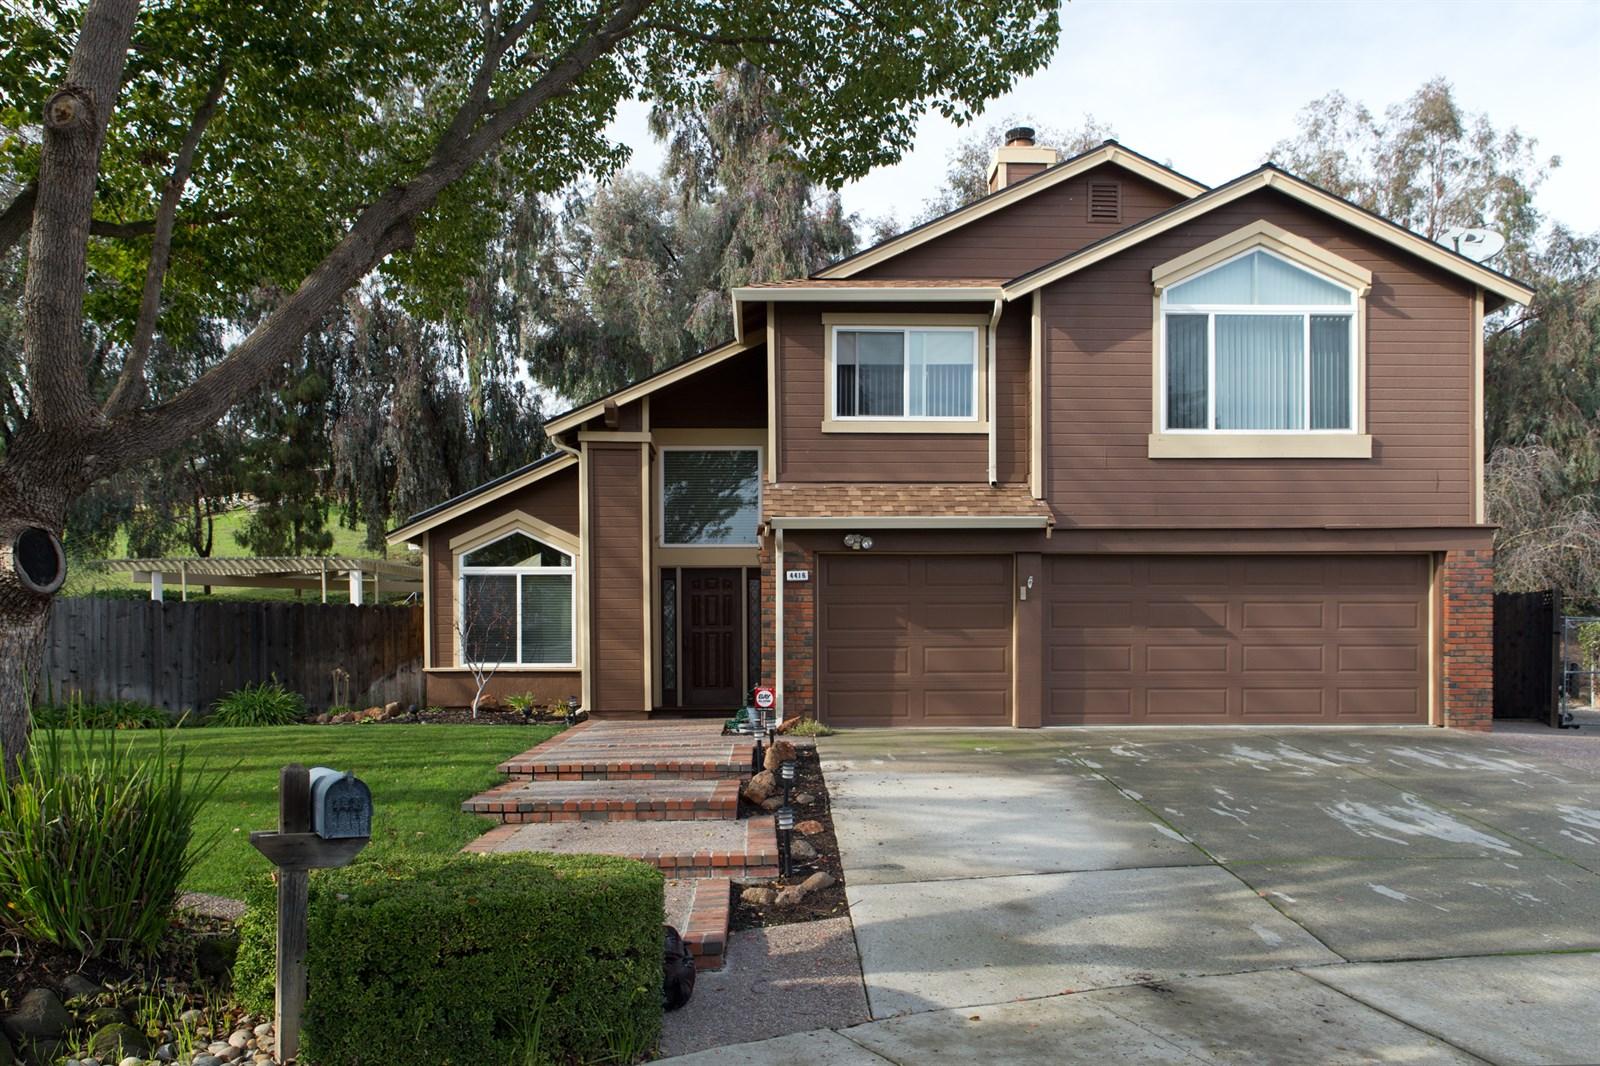 4416 Fawn Hill Ct, Antioch, CA 94531